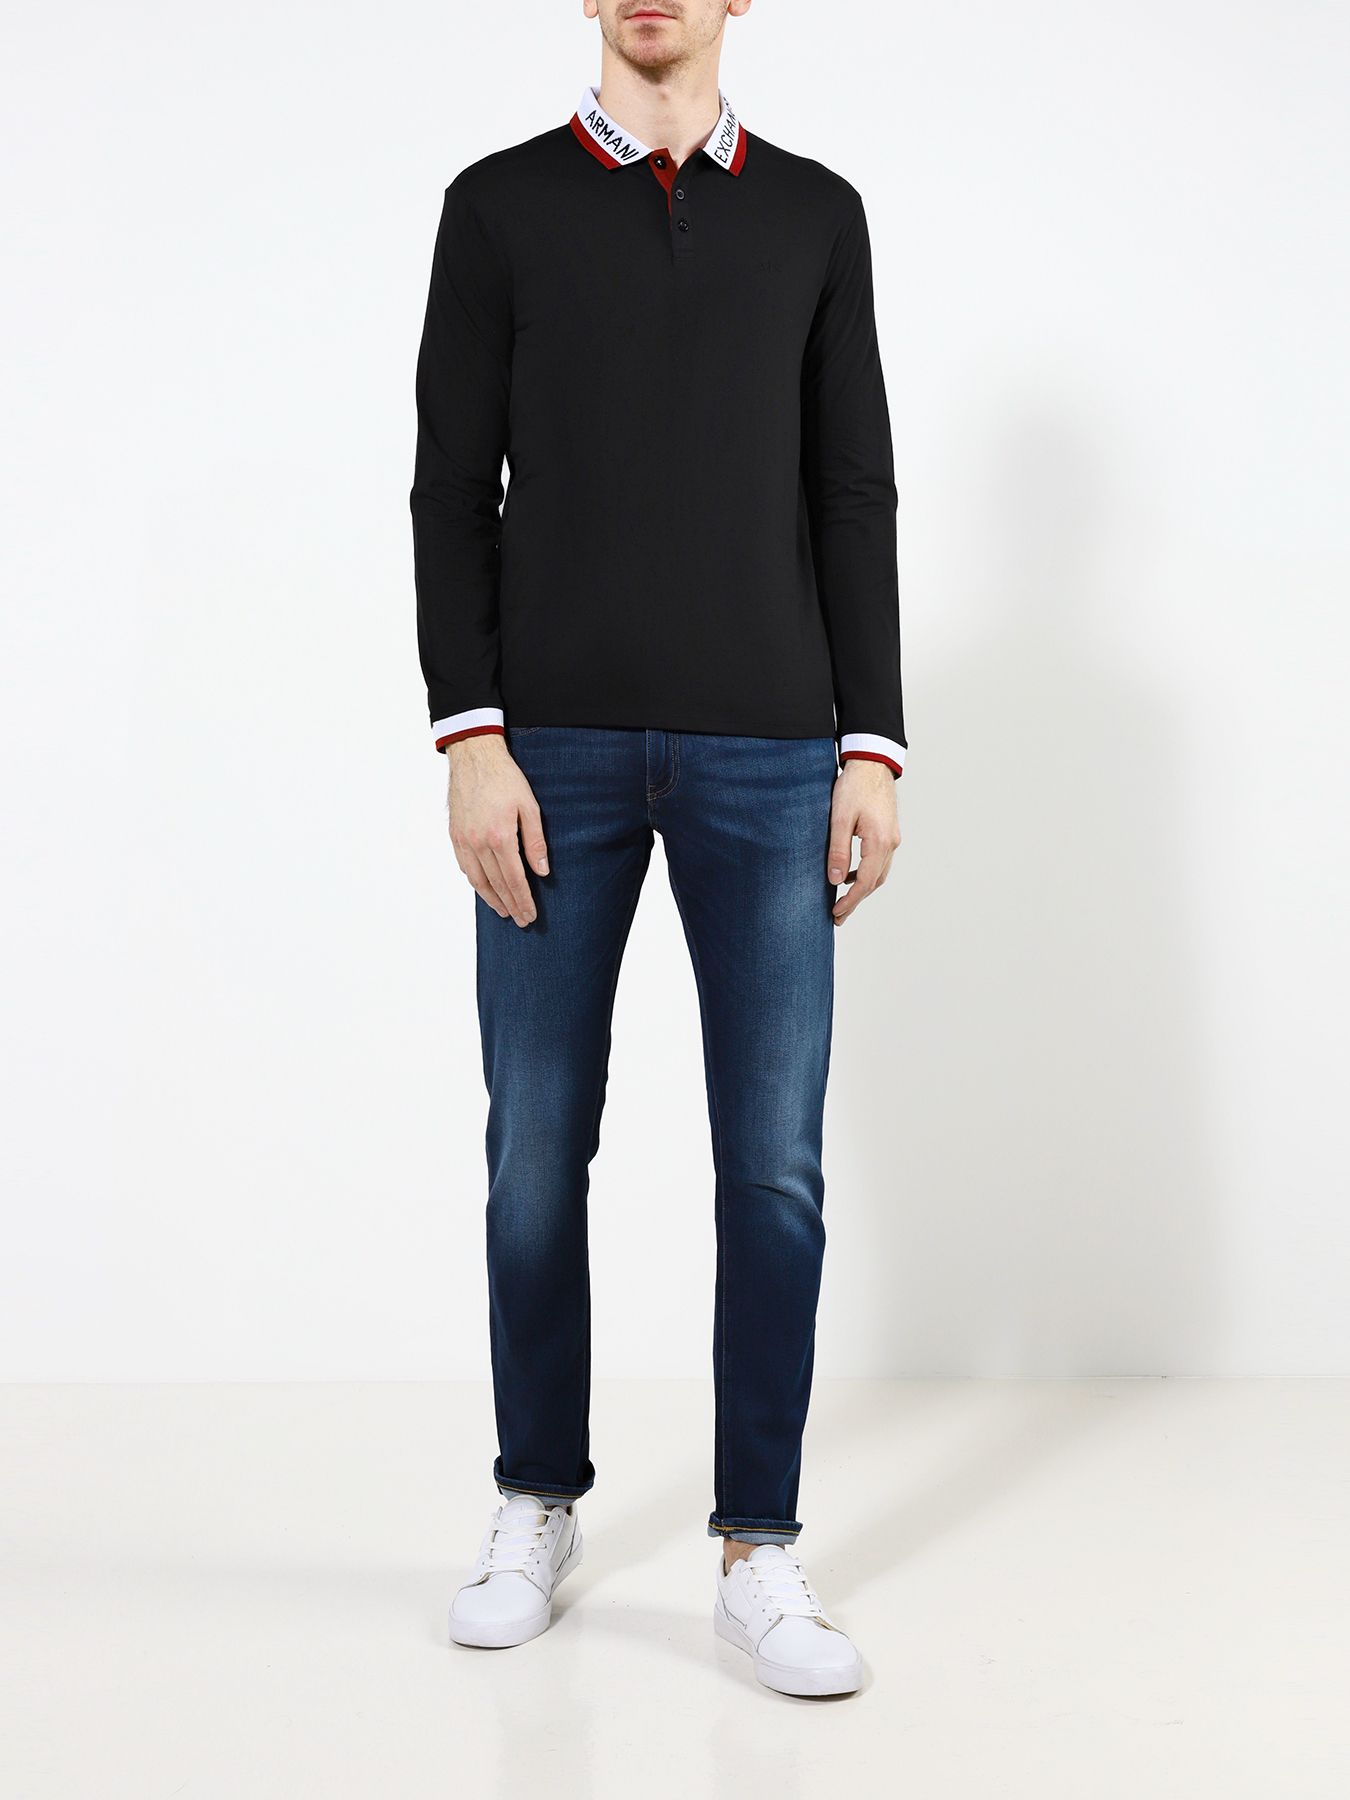 Рубашка поло Armani Exchange Поло с длинным рукавом